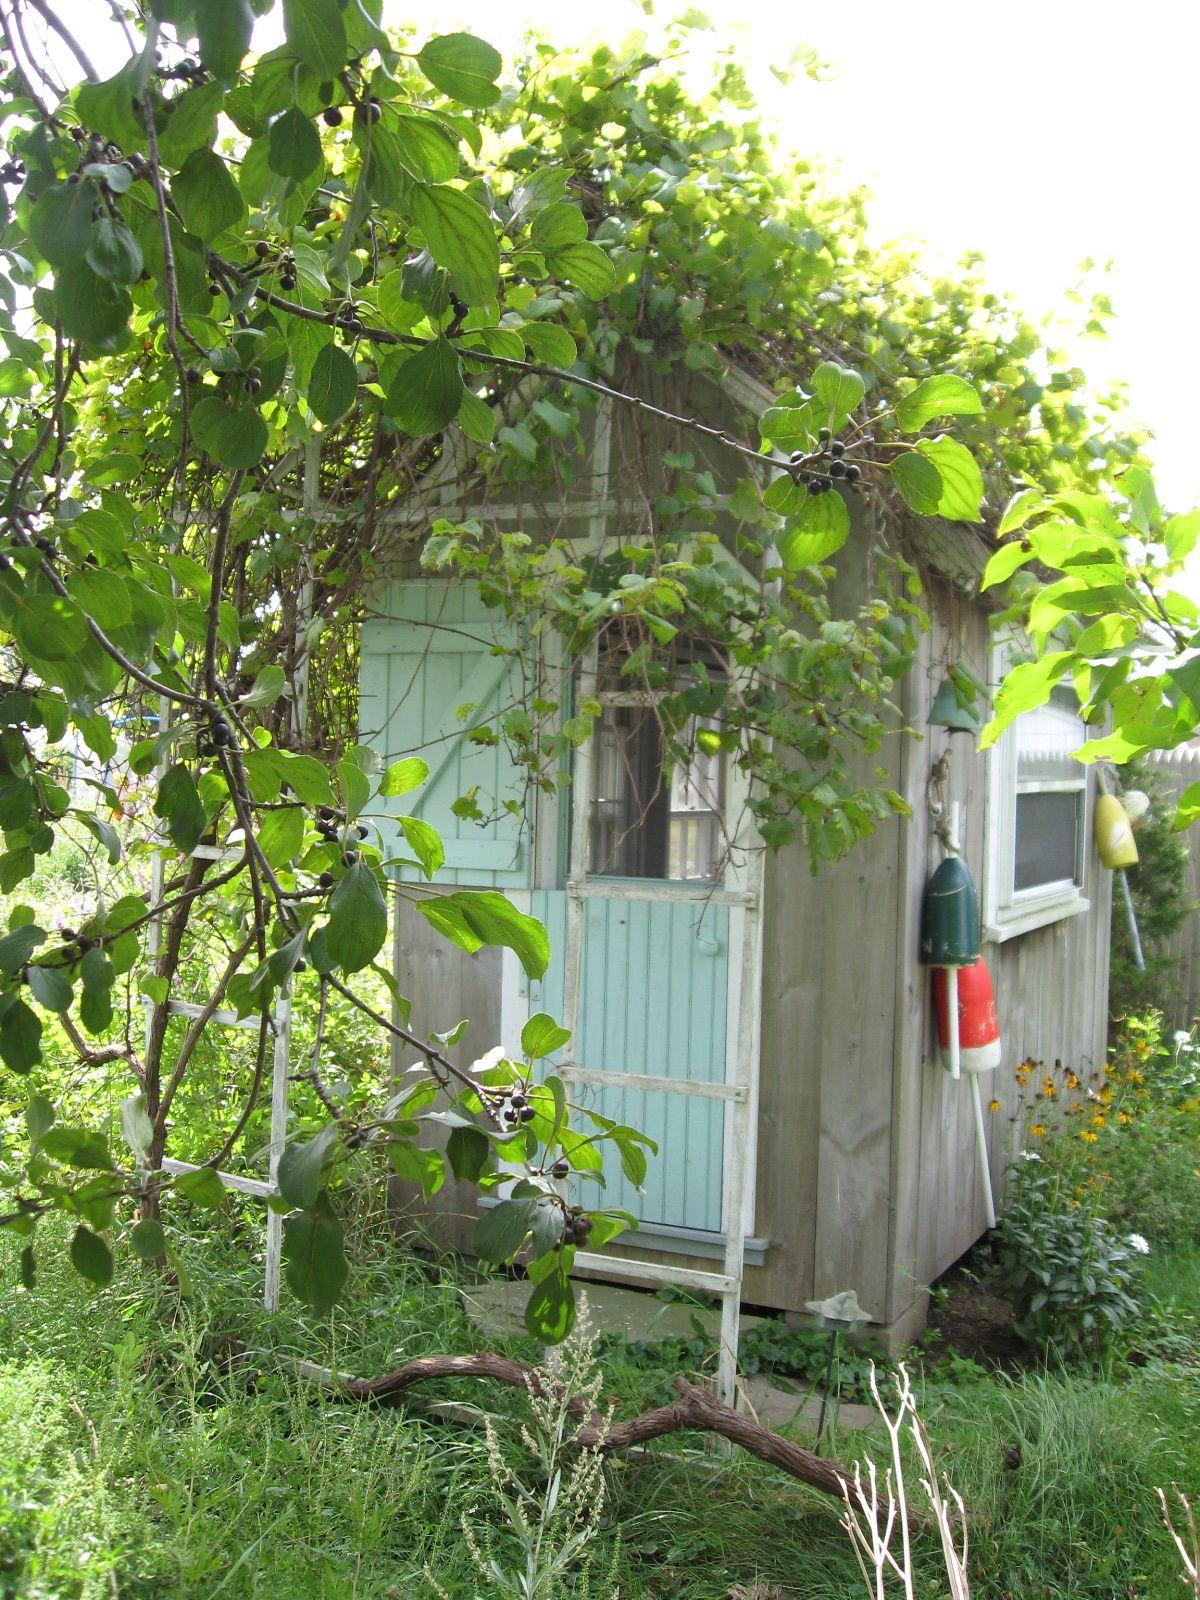 Garden folly with grape vine all grown in designed and for Garden folly designs